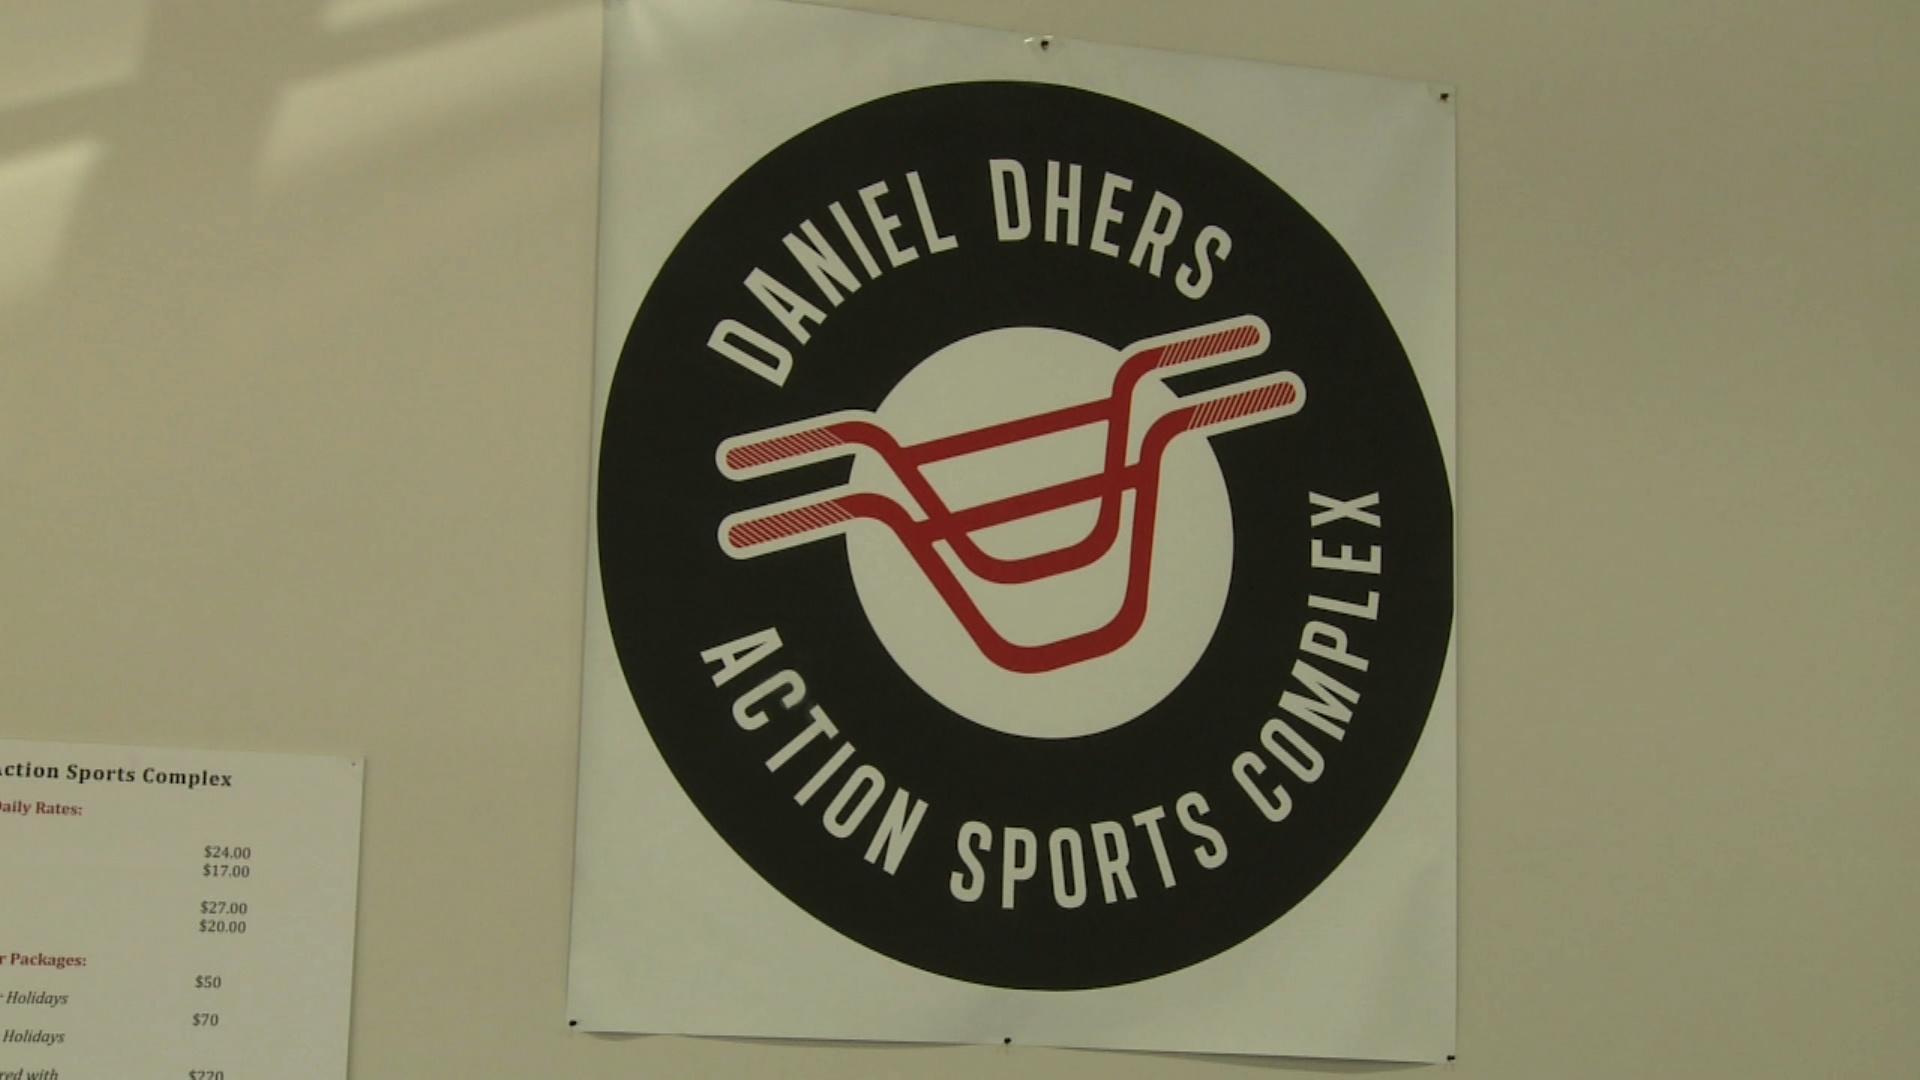 Daniel Dhers Action Sports Complex image